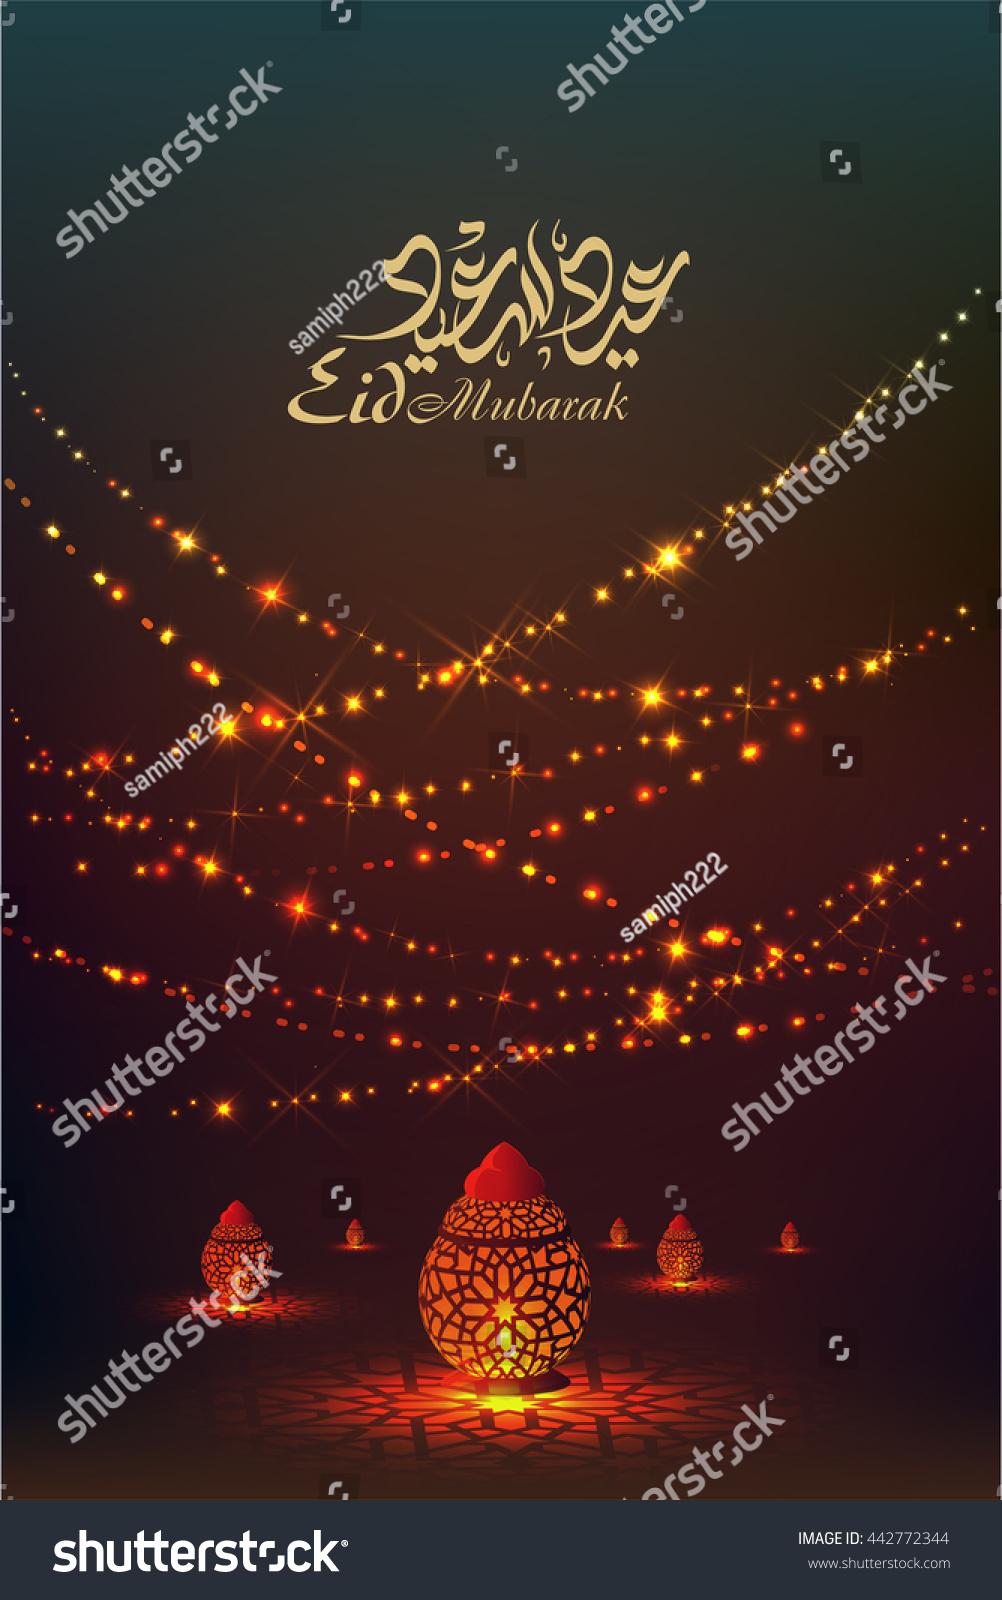 Eid mubarak greeting card eid said stock vector 442772344 shutterstock eid mubarak greeting card eid said eid al fitr eid al adha kristyandbryce Choice Image